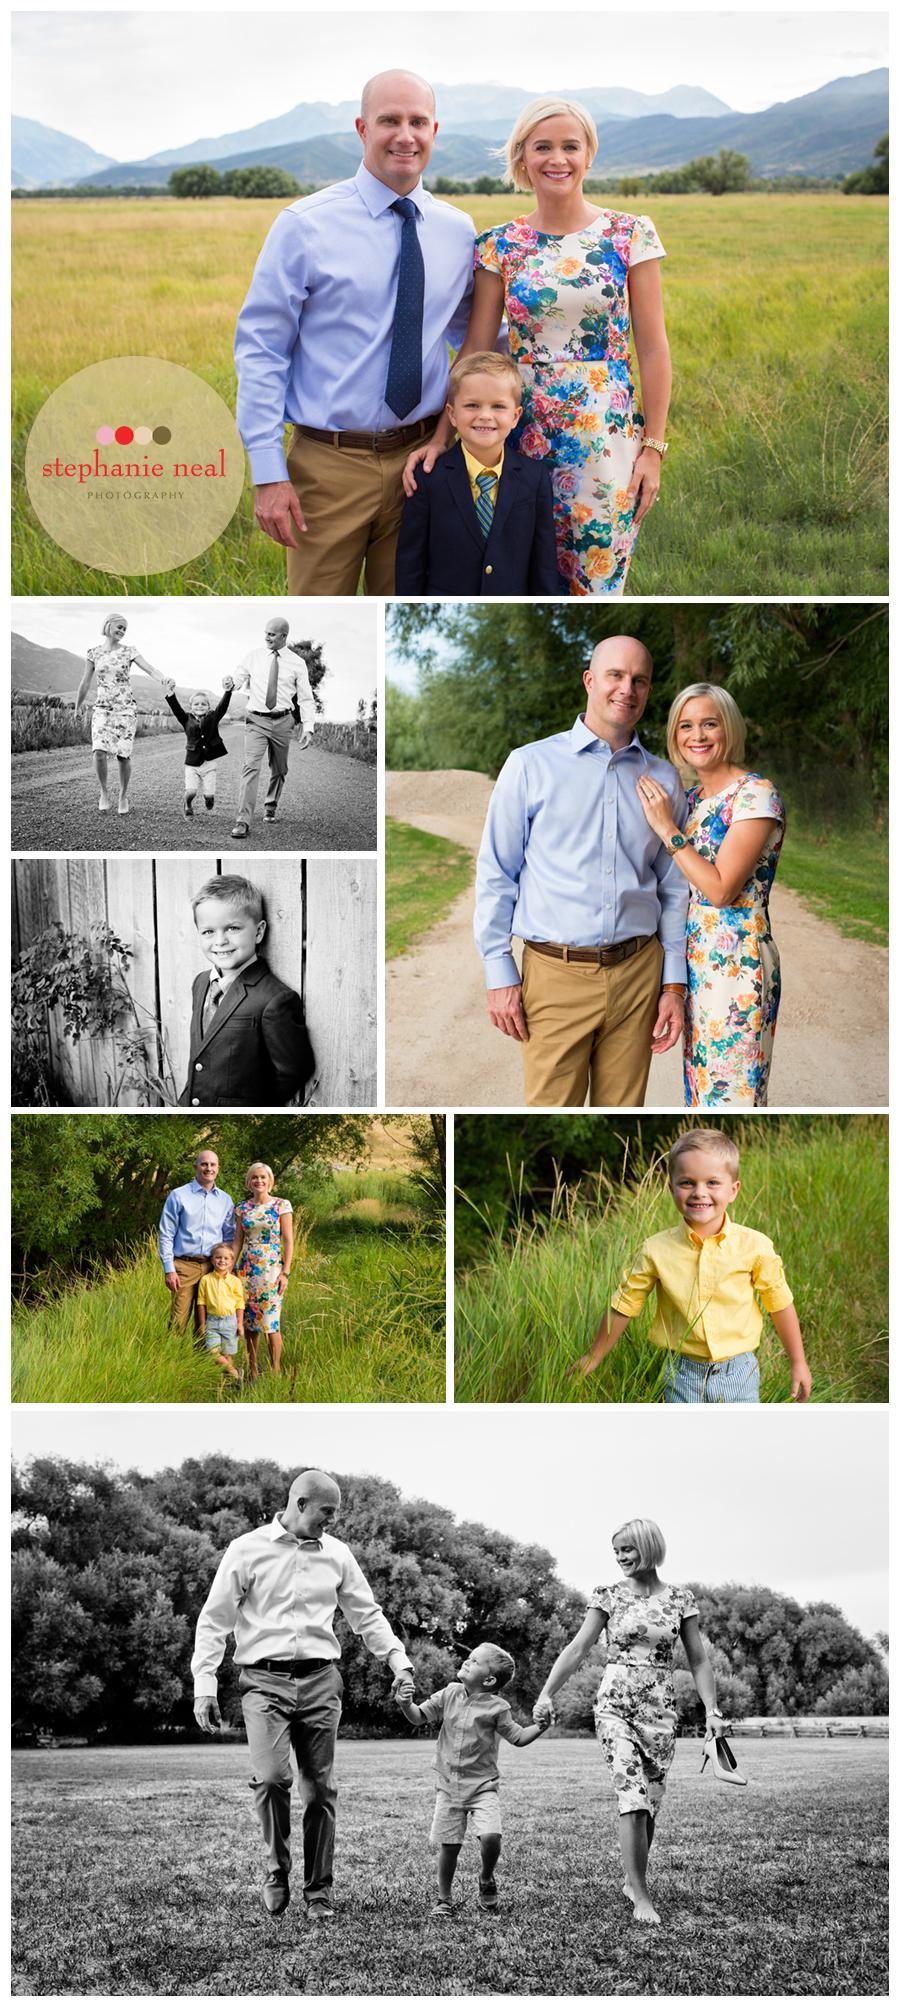 Stephanie Neal Photography Park City Midway Utah Family Photographer